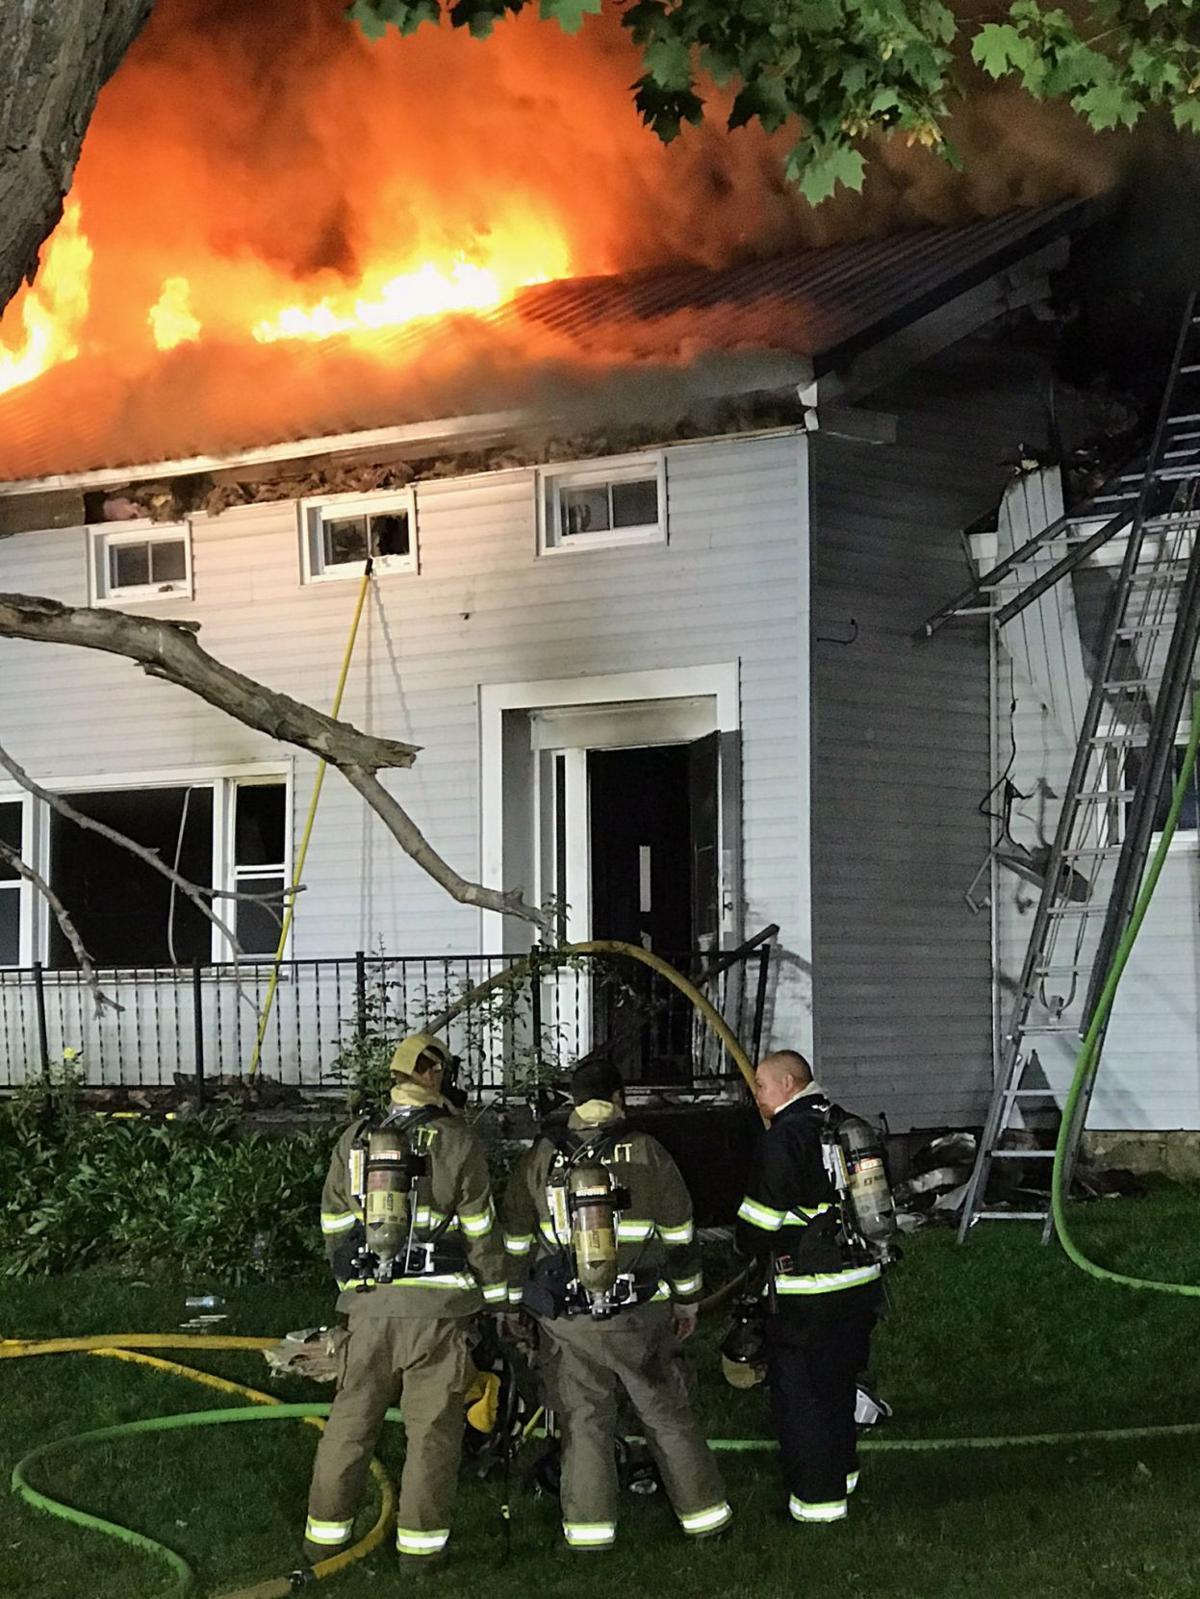 Niles house fire